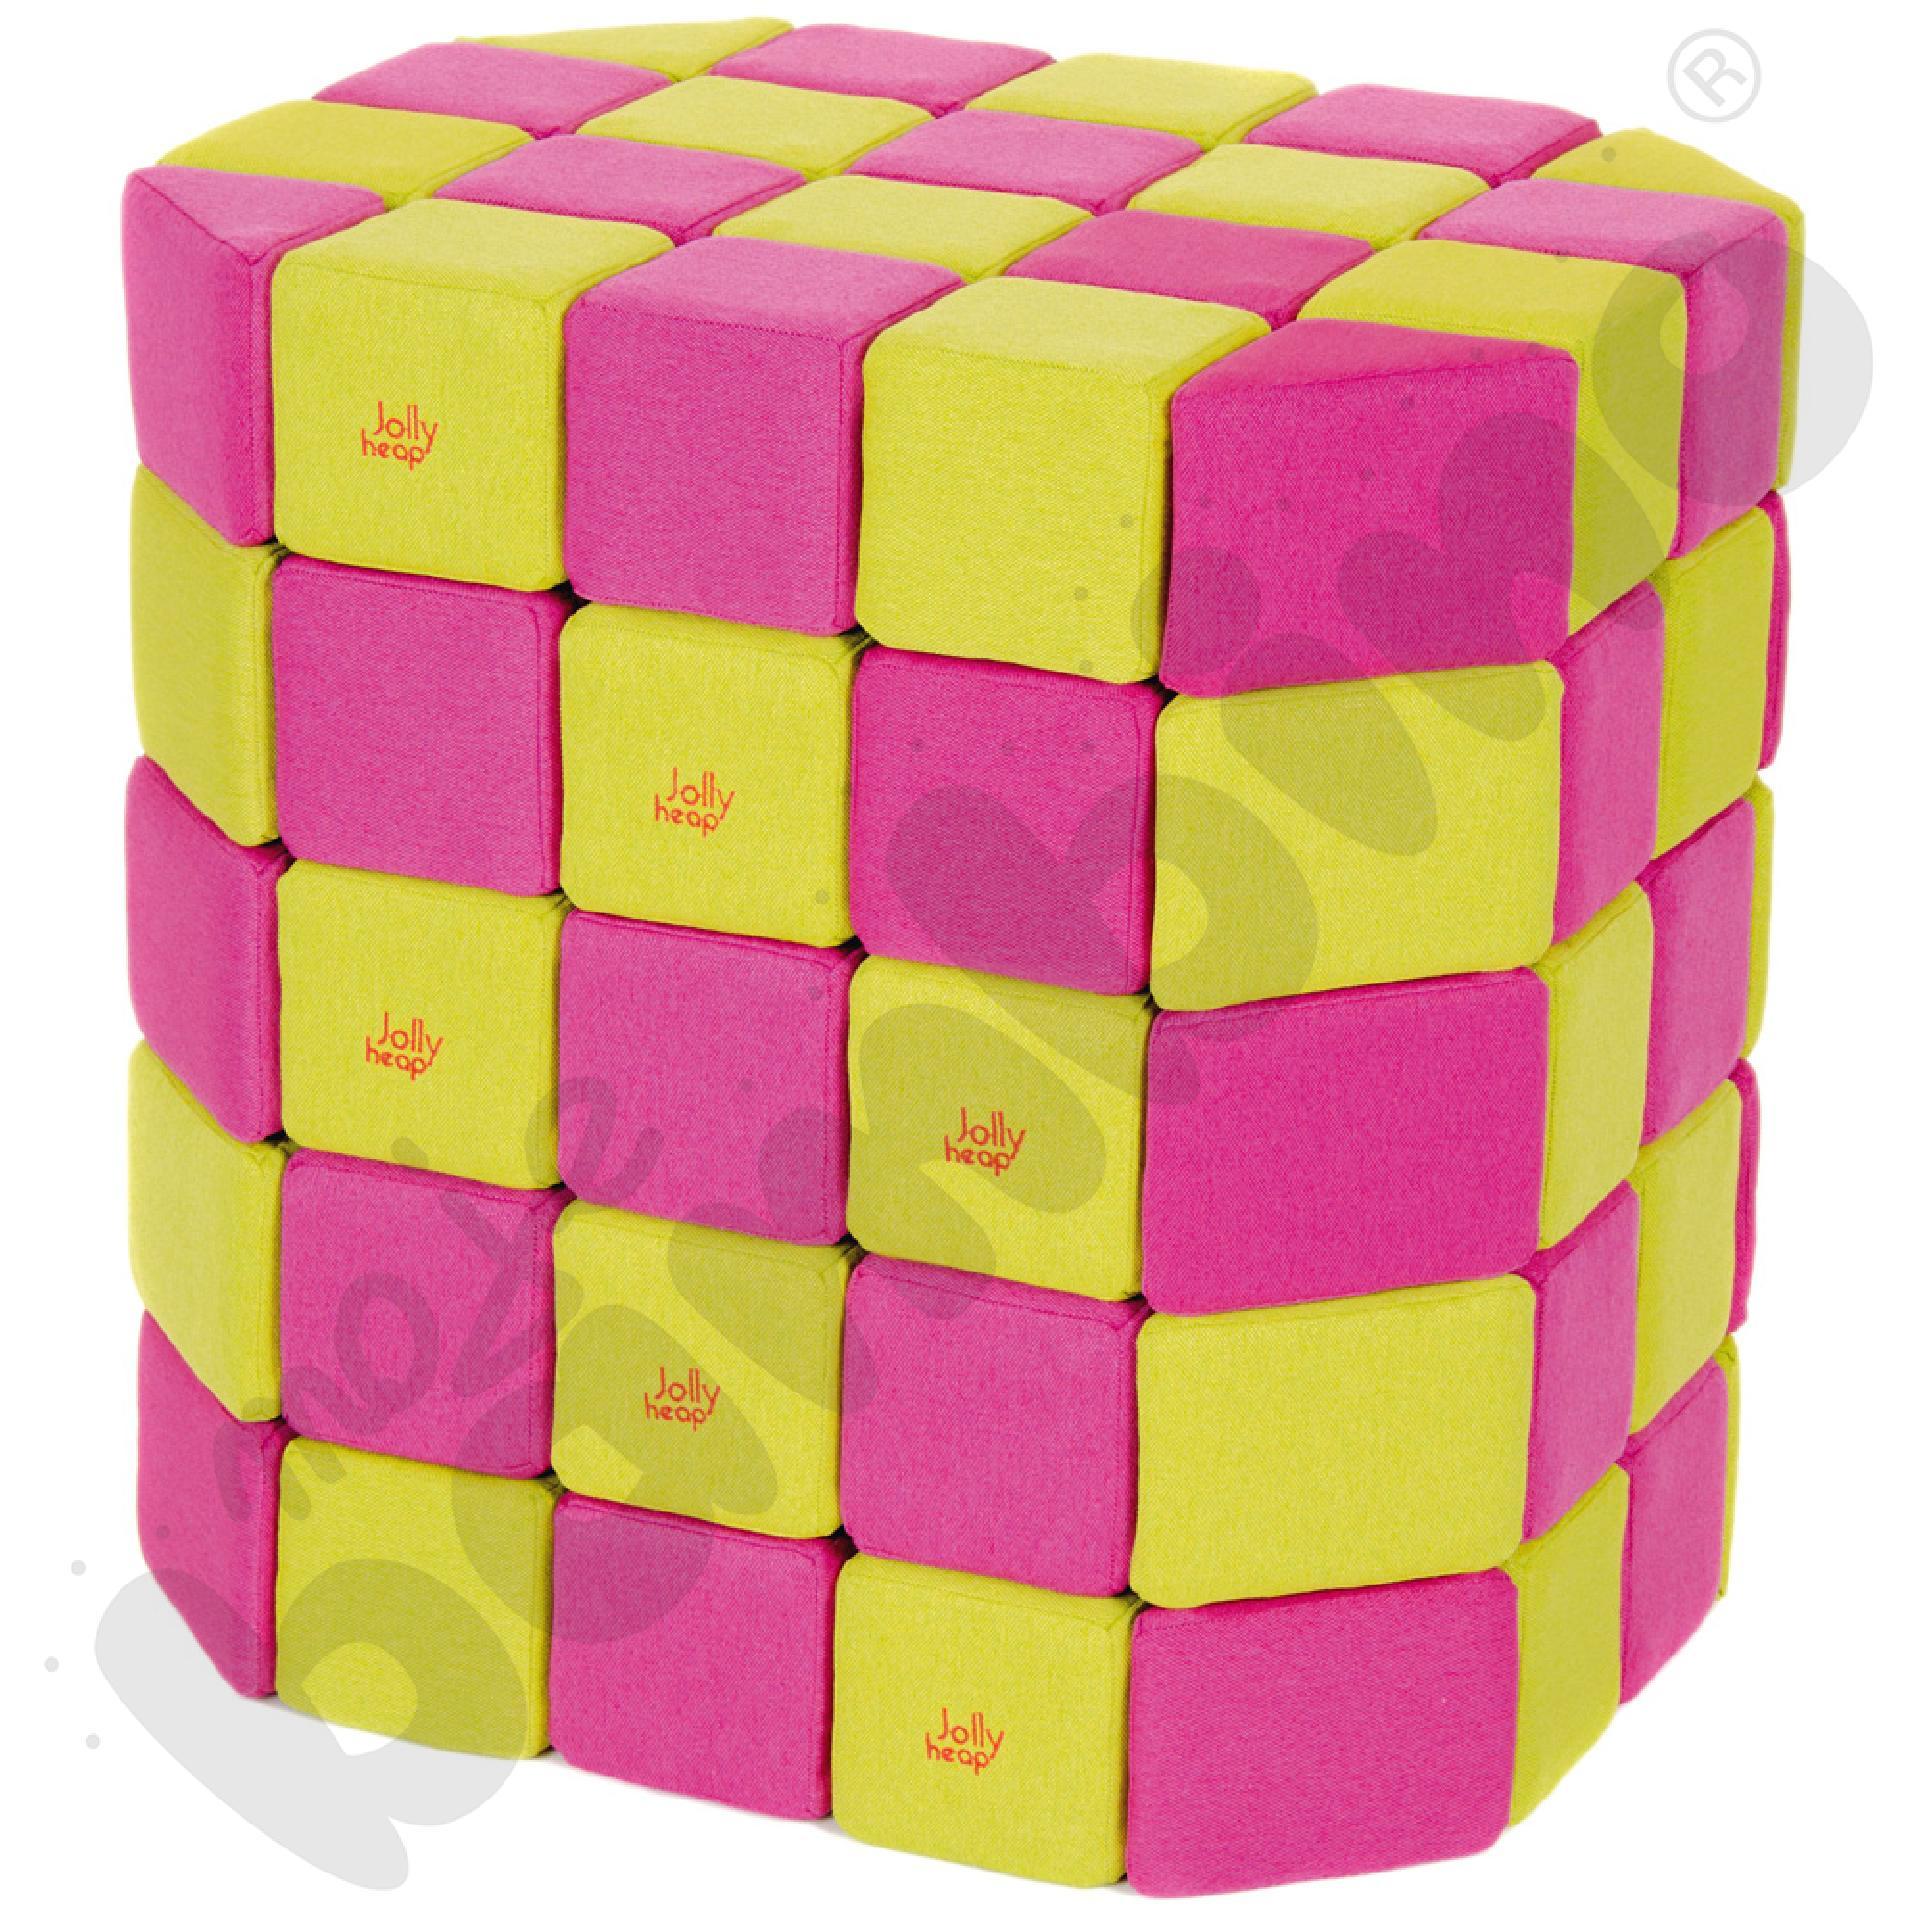 Zestaw klocków JollyHeap - różowo-limonkowe, 100 szt.